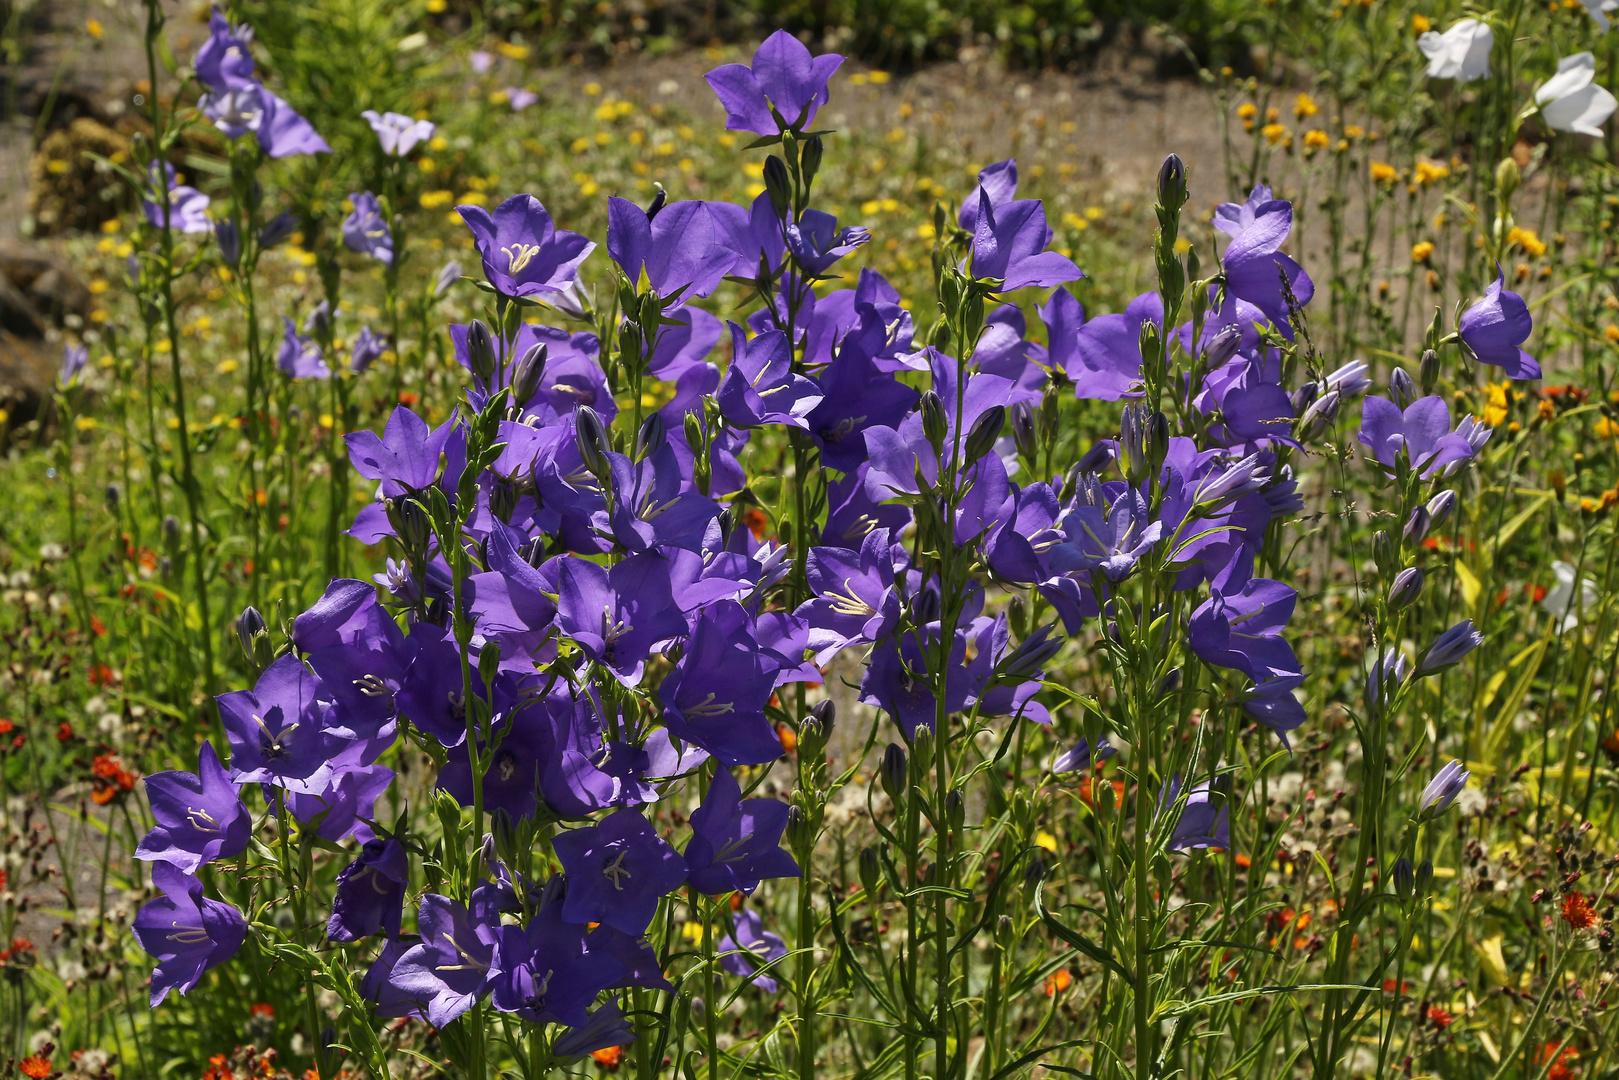 blaue glockenblumen 2017 06 19 eos 100d 1767 ji foto bild blau glockenblume ulrichstein. Black Bedroom Furniture Sets. Home Design Ideas